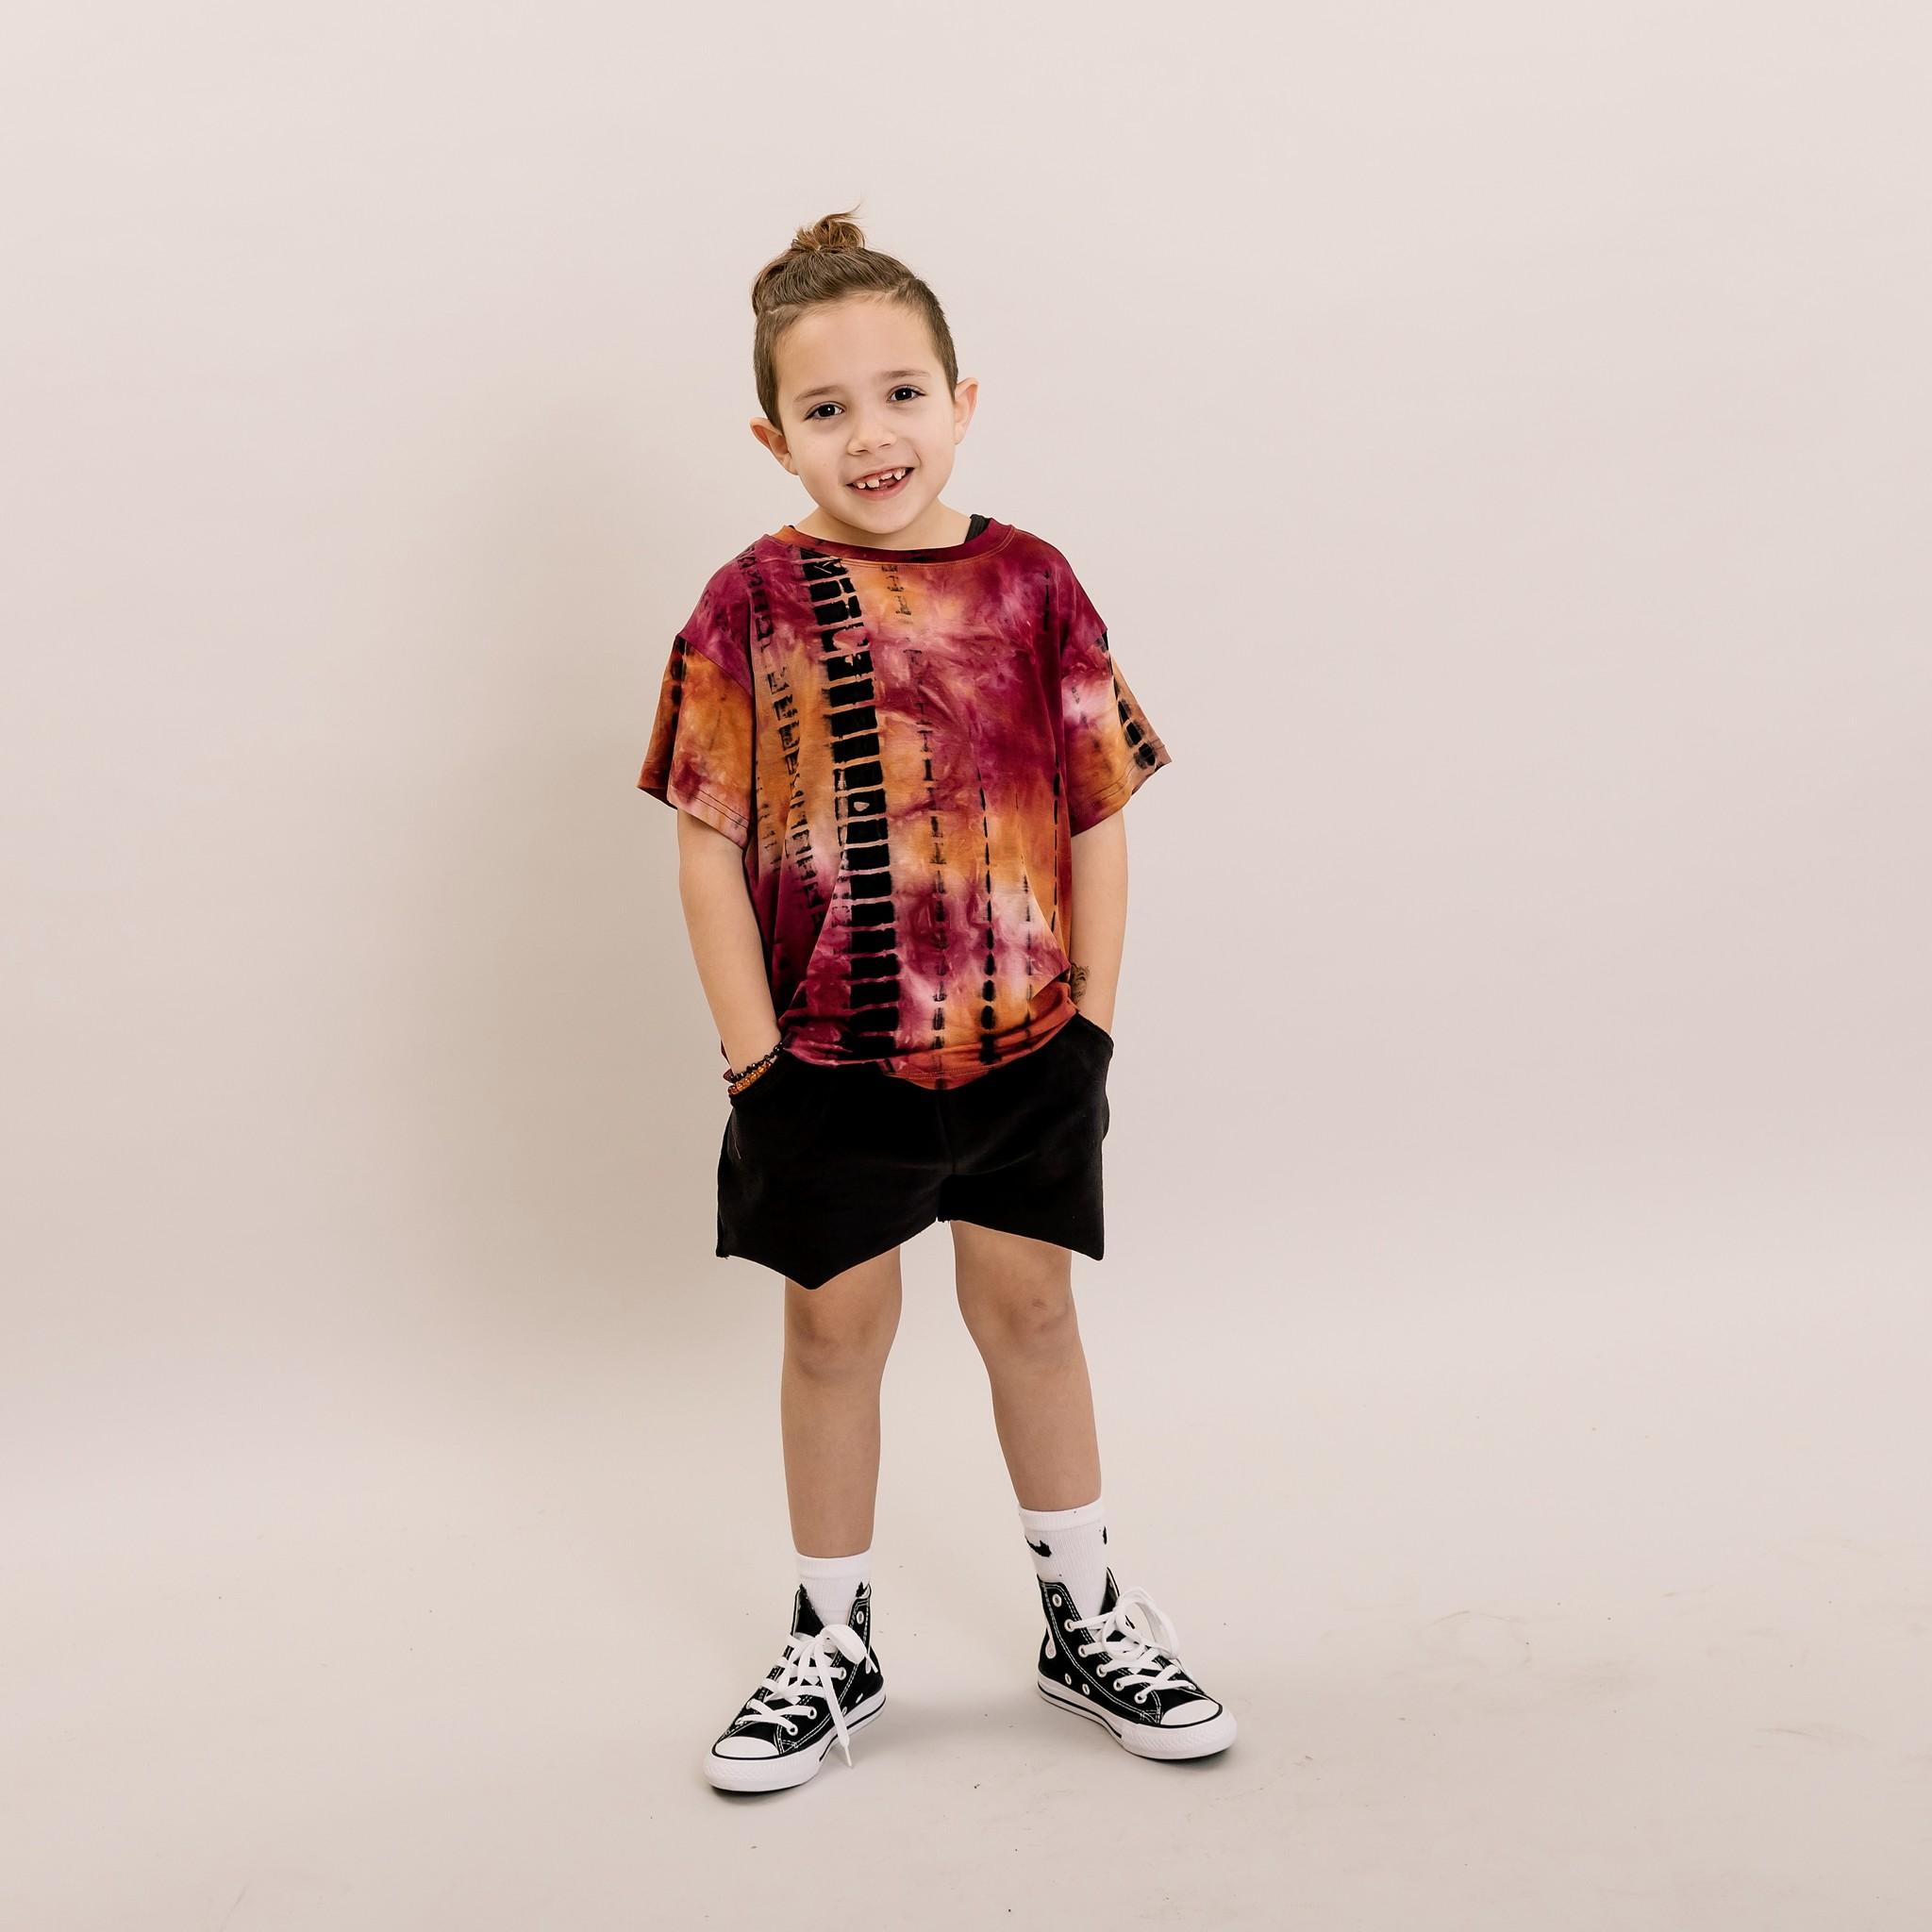 No Labels Kidswear ZWARTE BERMUDA | KORTE BROEK ZWART | KINDERKLEDING